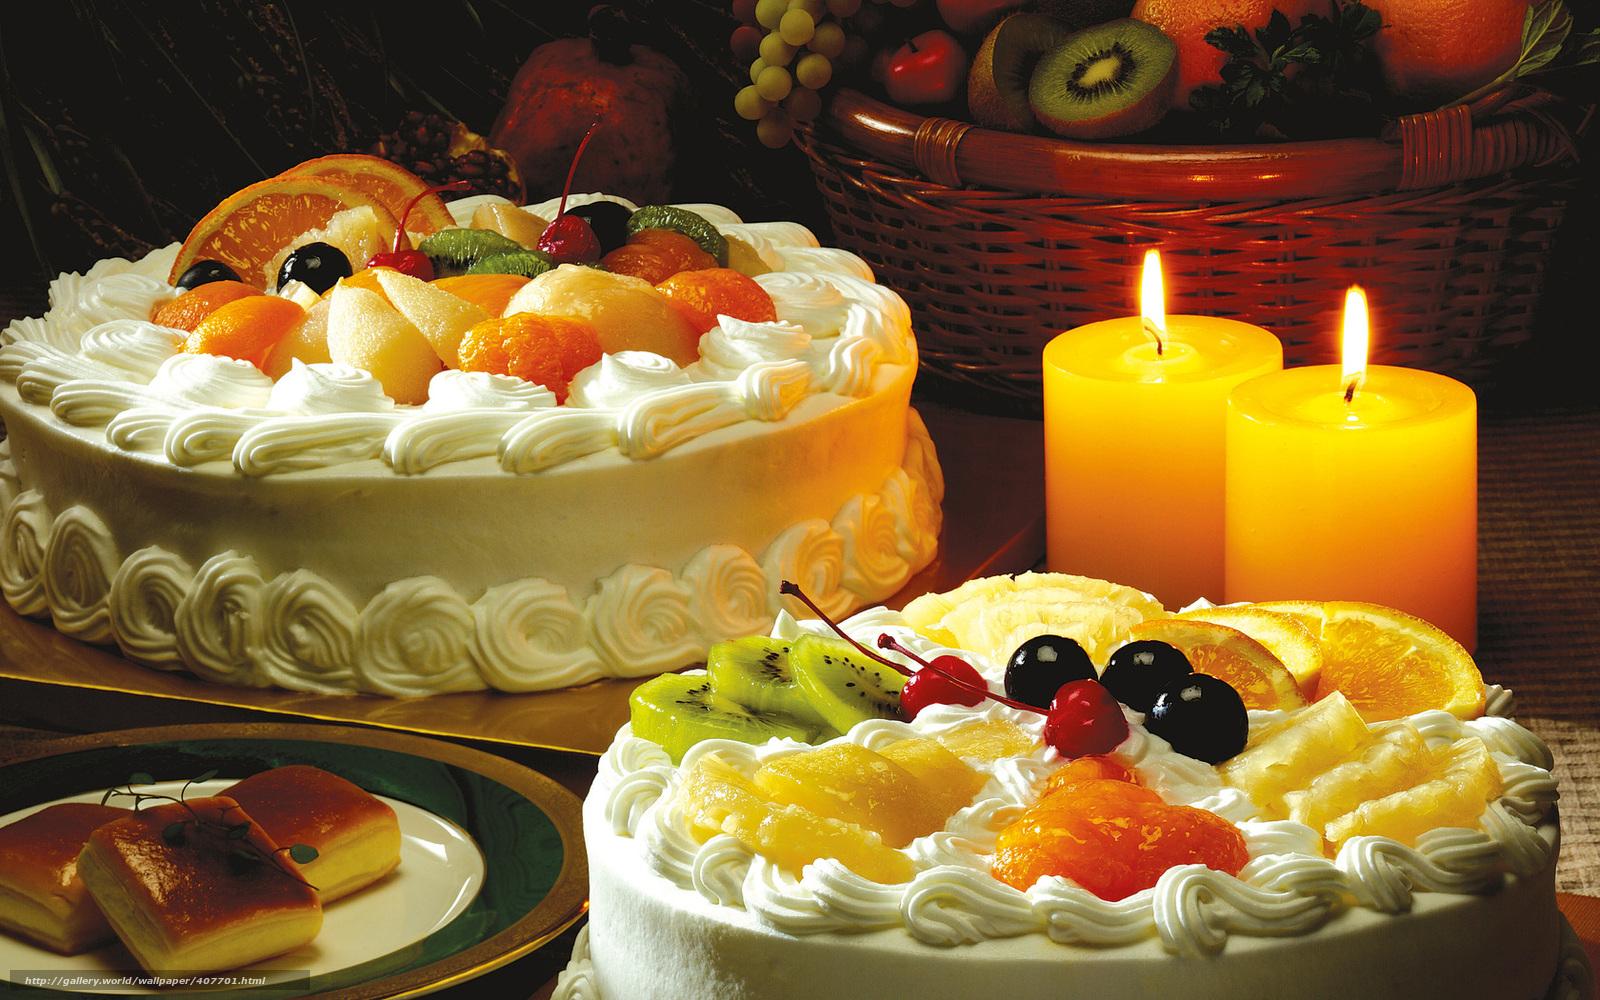 Download wallpaper dessert,  Cakes,  cream,  fruit free desktop wallpaper in the resolution 1680x1050 — picture №407701